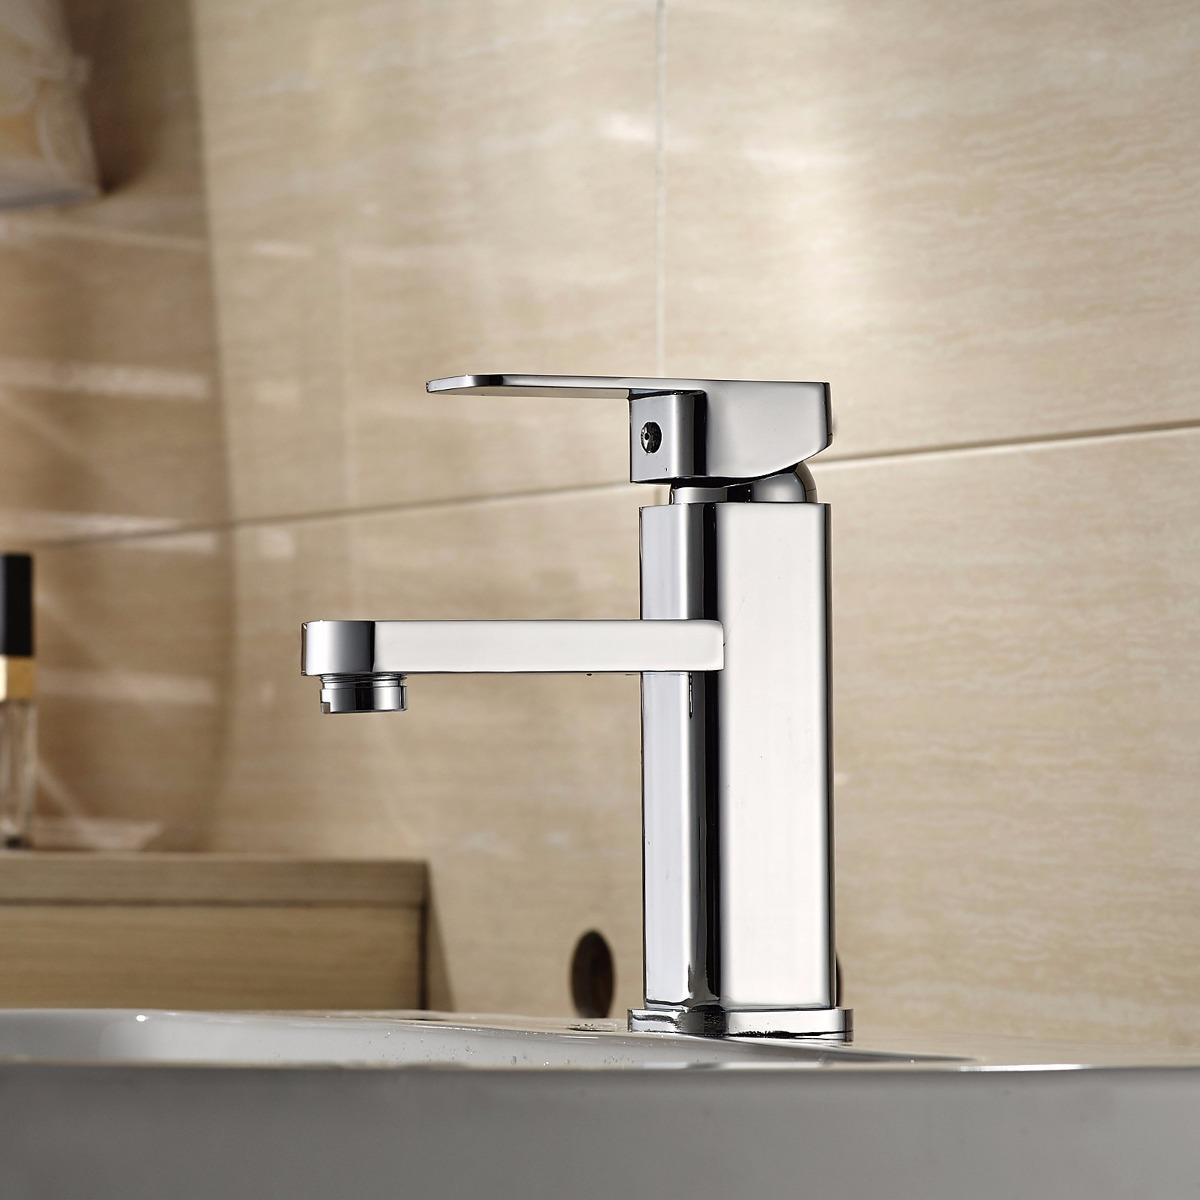 Odbo lb 9831a monomando mezcladora para lavabo en cromo en mercado libre - Monomando lavabo ...